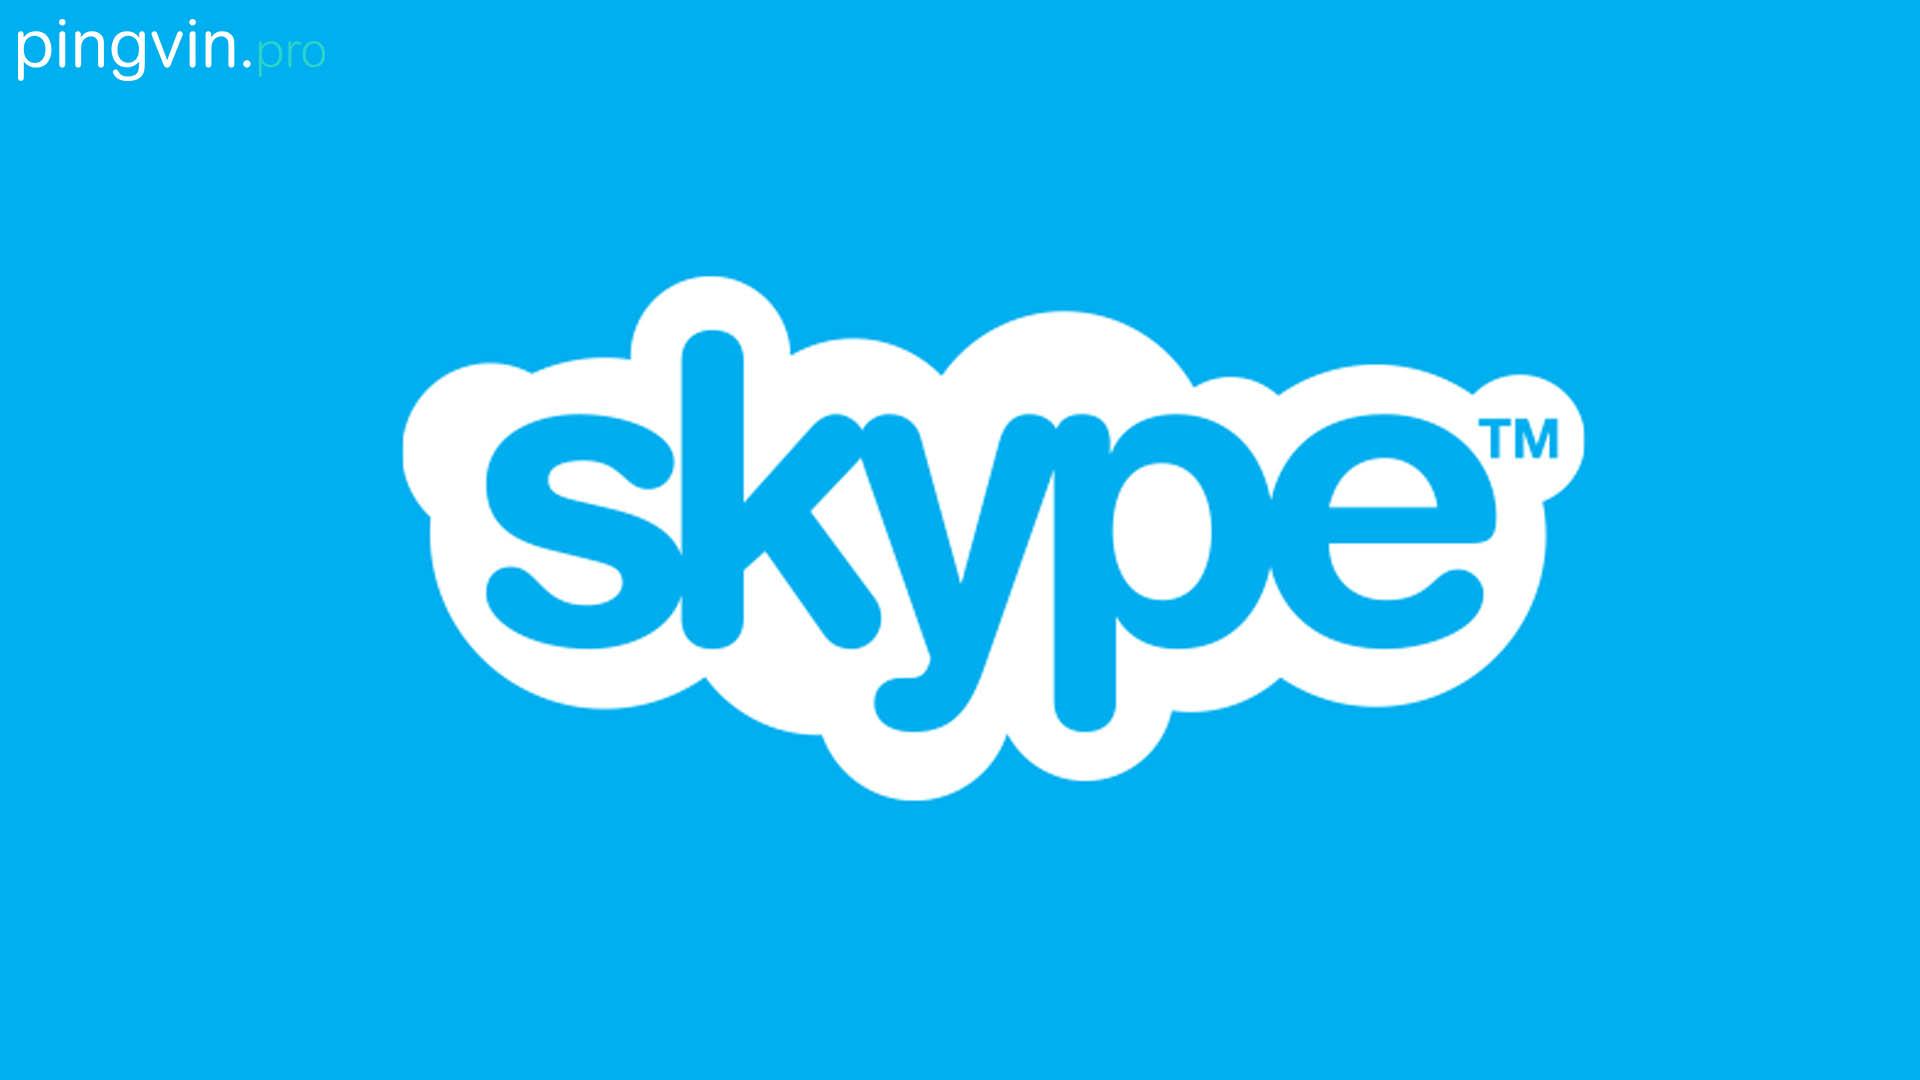 У Skype для Android виявили серйозну помилку